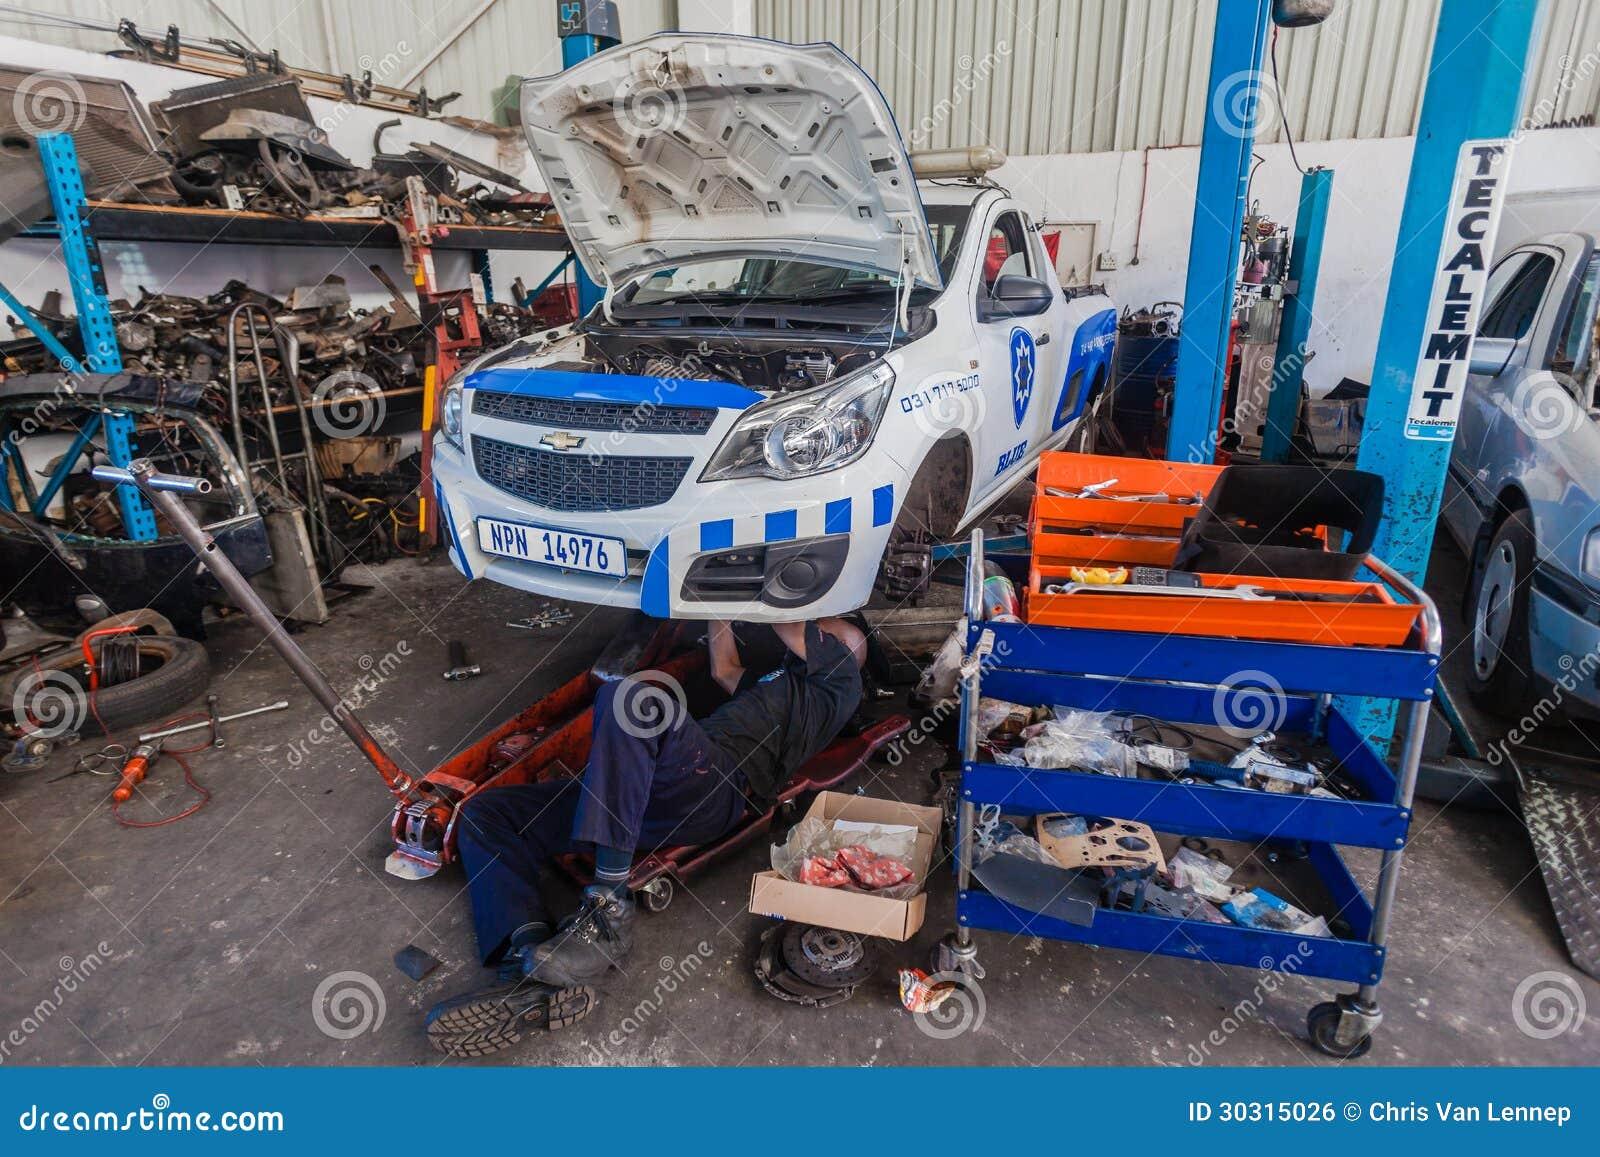 Private Garages For Diesel Machanics : Mechanic man workshop vehicle repairs editorial photo